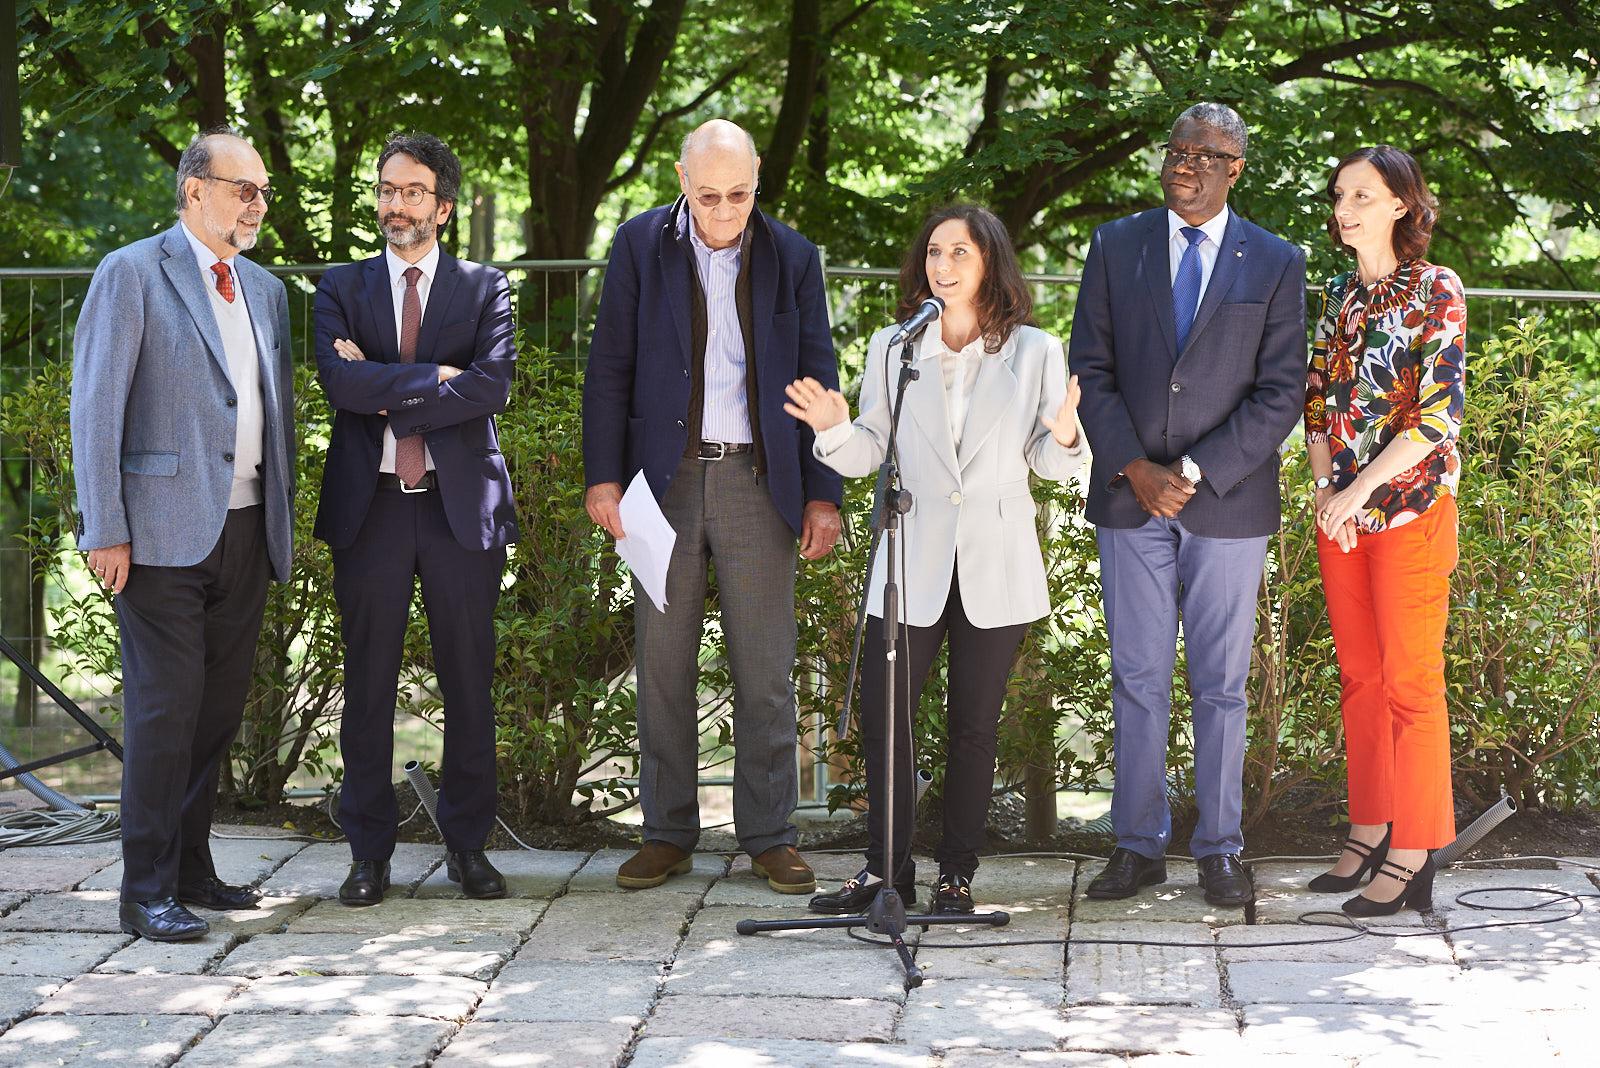 From left: Giorgio Mortara, UCEI vice-president, Lamberto Bertolé, president of the Milan municipal Council, Gabriele Nissim, Gariwo Chairman, Martina Landi, Gariwo editor in chief, Dr. Denis Mukwege and Anna Pozzi, journalist